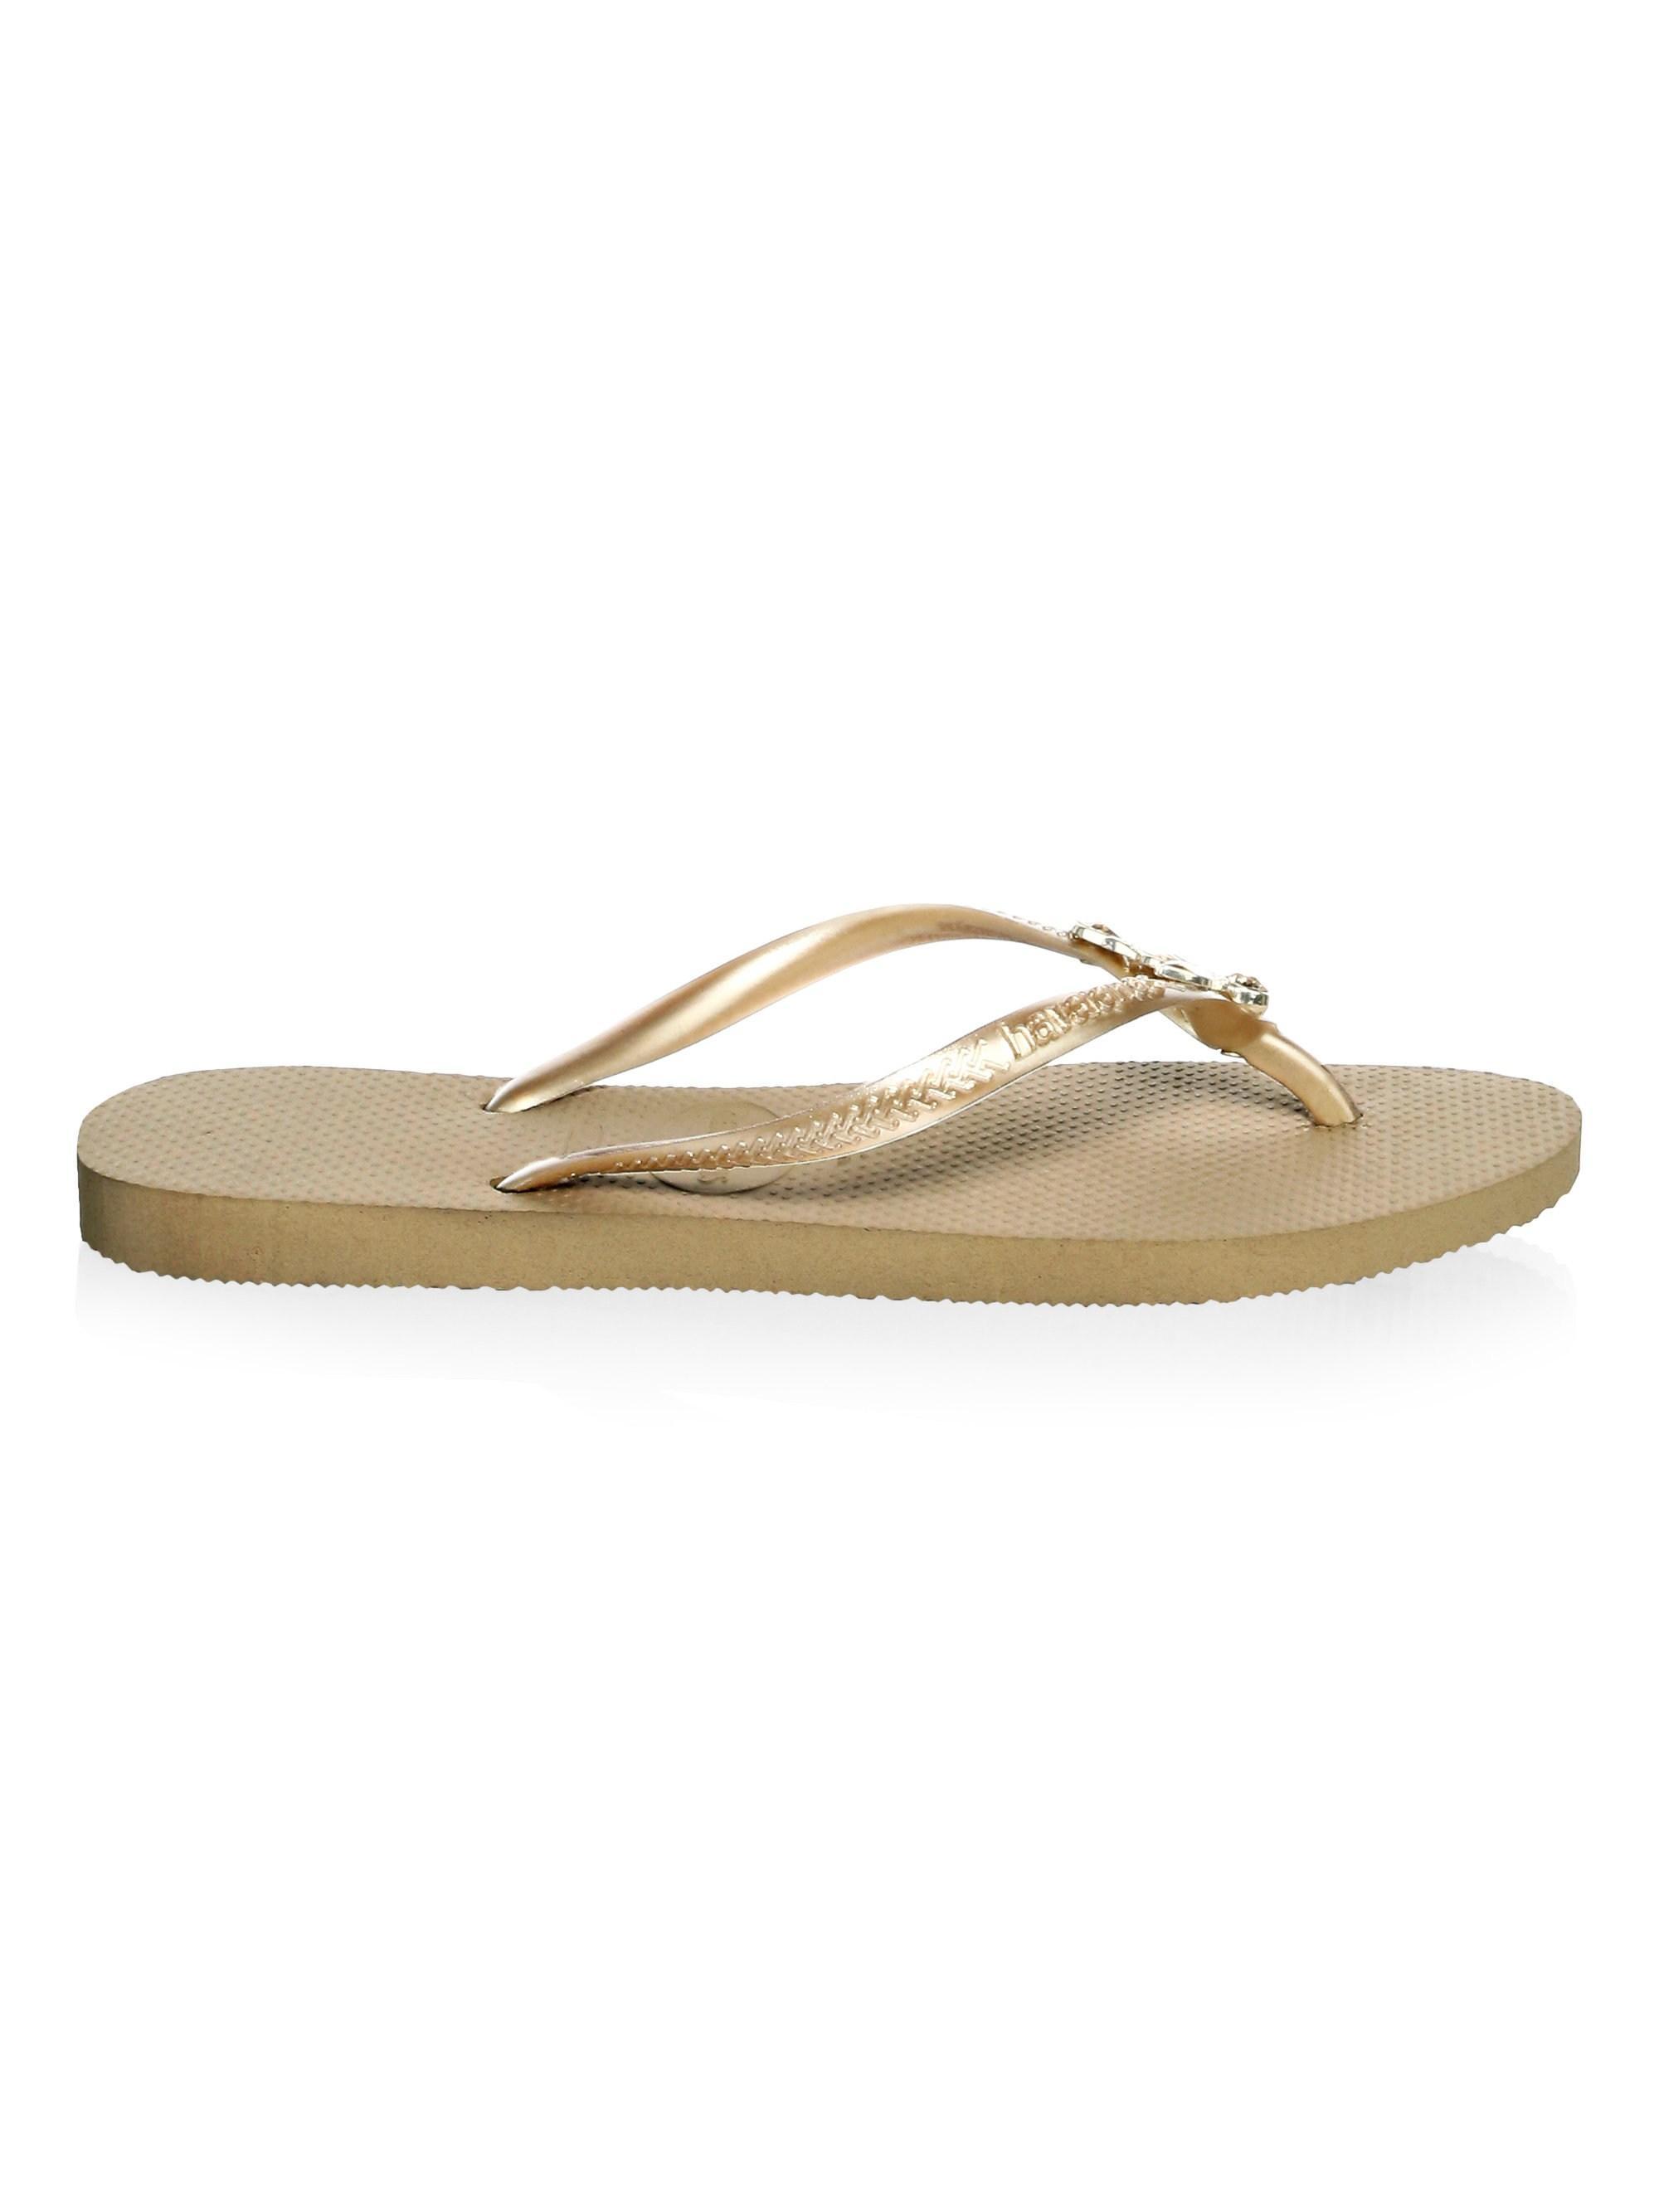 183c07d3df8b2 Lyst - Havaianas Women s Slim Lux Swarovski Crystal Flip Flops ...